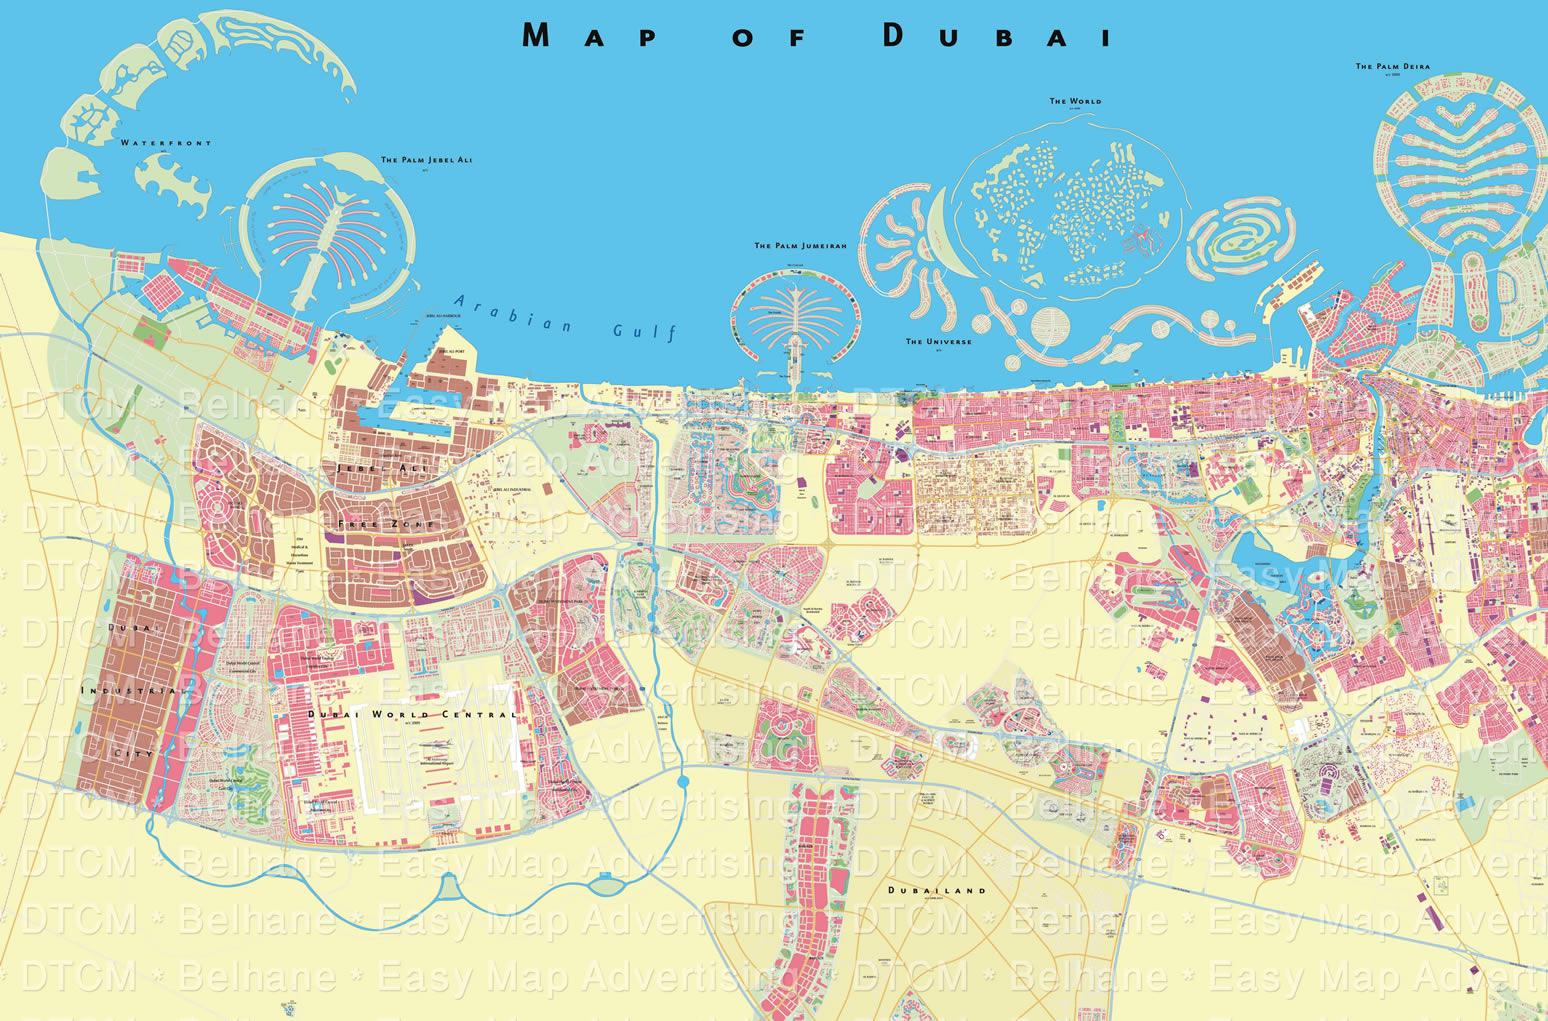 DUBAI-MAP+02 Dubai Map on africa map, arabian gulf map, europe map, germany map, united arab emirates, dubai international airport, sharjah city map, japan map, middle east map, dubai mall, fujairah map, emirates airline, dead sea map, spain map, uae map, abu dhabi map, burj al-arab, turkey map, istanbul map, abu dhabi, kuwait map, israel map, qatar map, ski dubai, seattle map, palm islands, palm jumeirah, beirut map, burj khalifa,